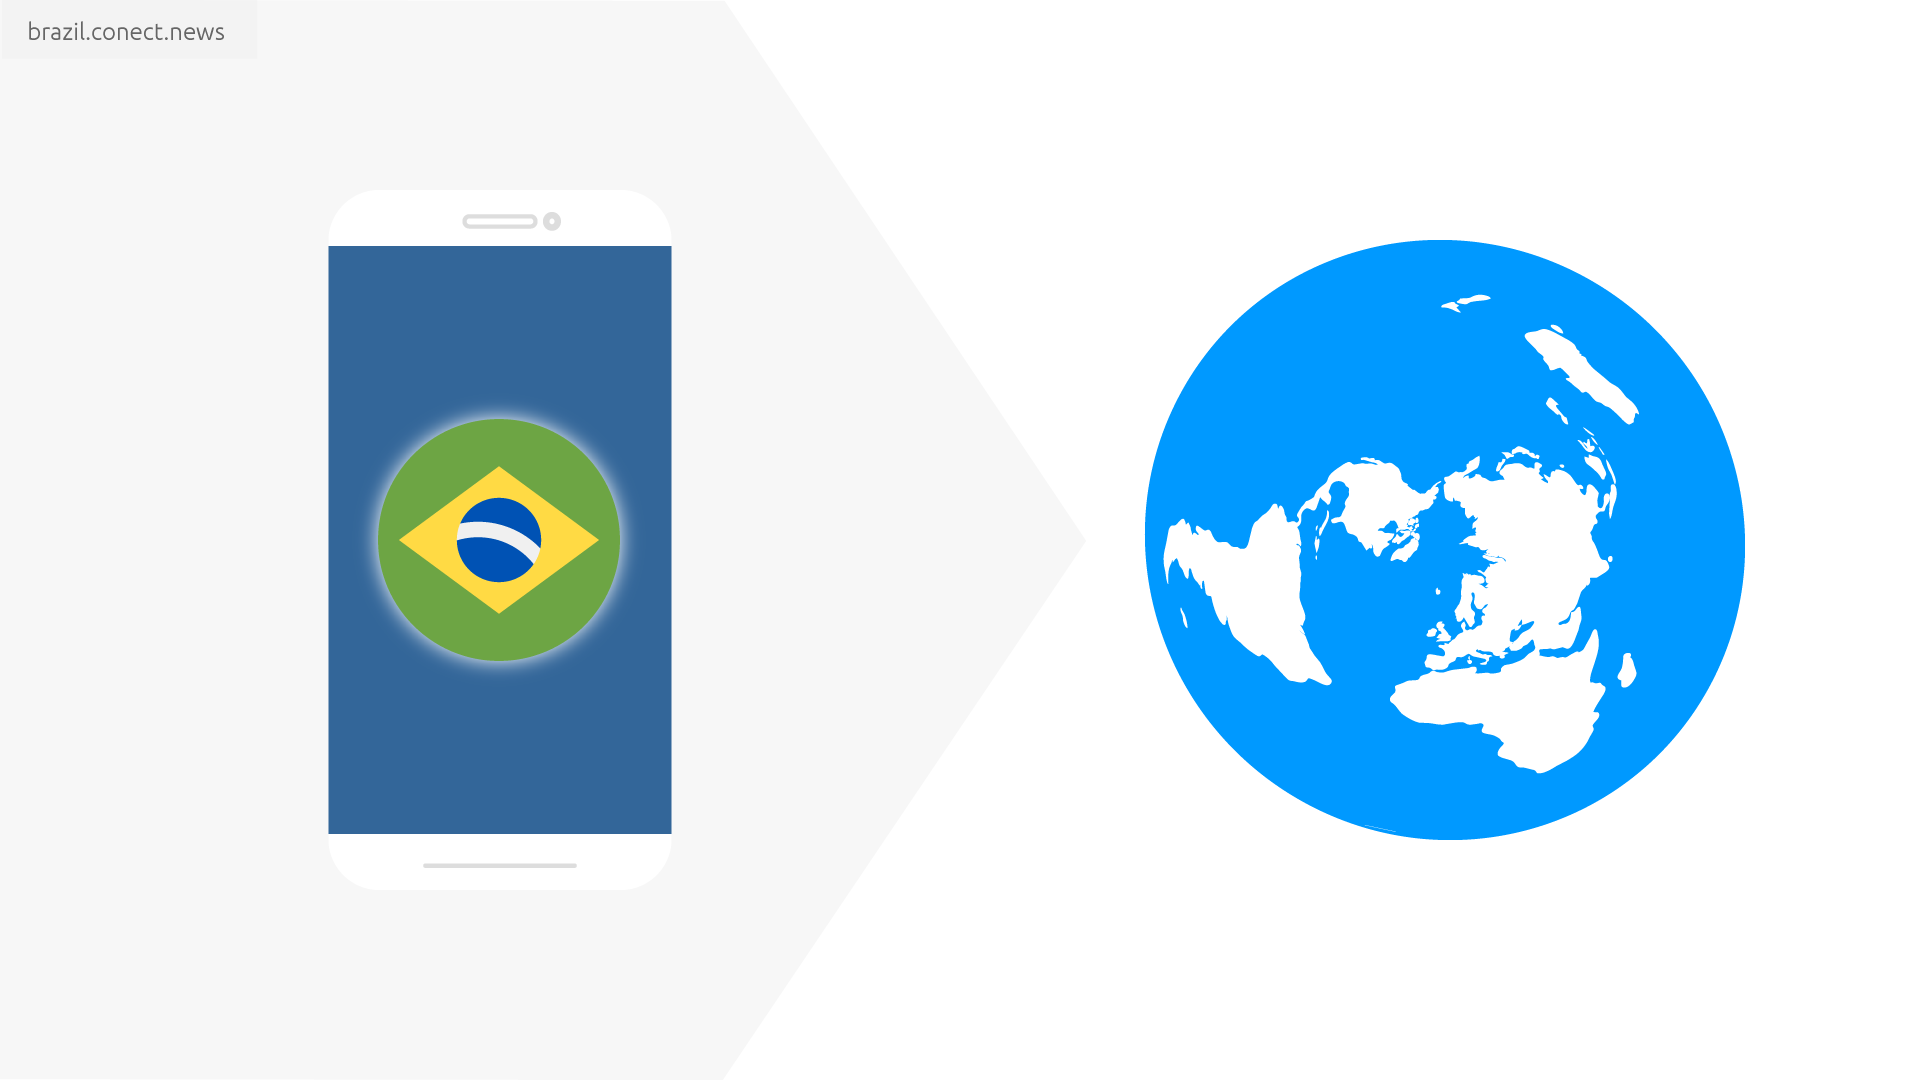 brasilien-international@conect_news